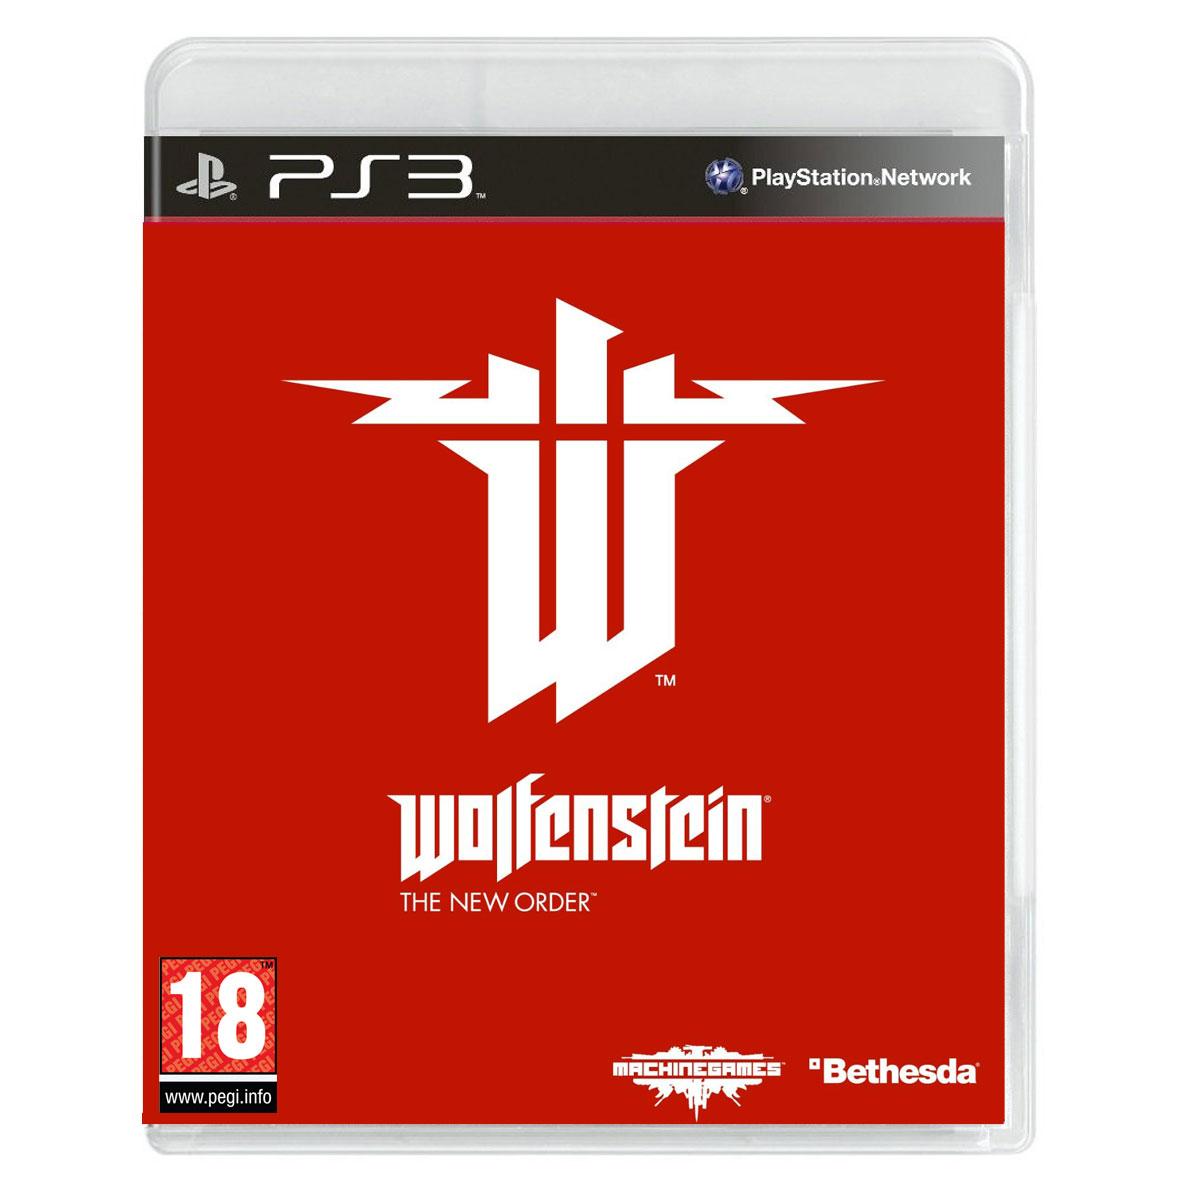 LDLC.com Wolfenstein : The New Order (PS3) Wolfenstein : The New Order (PS3)